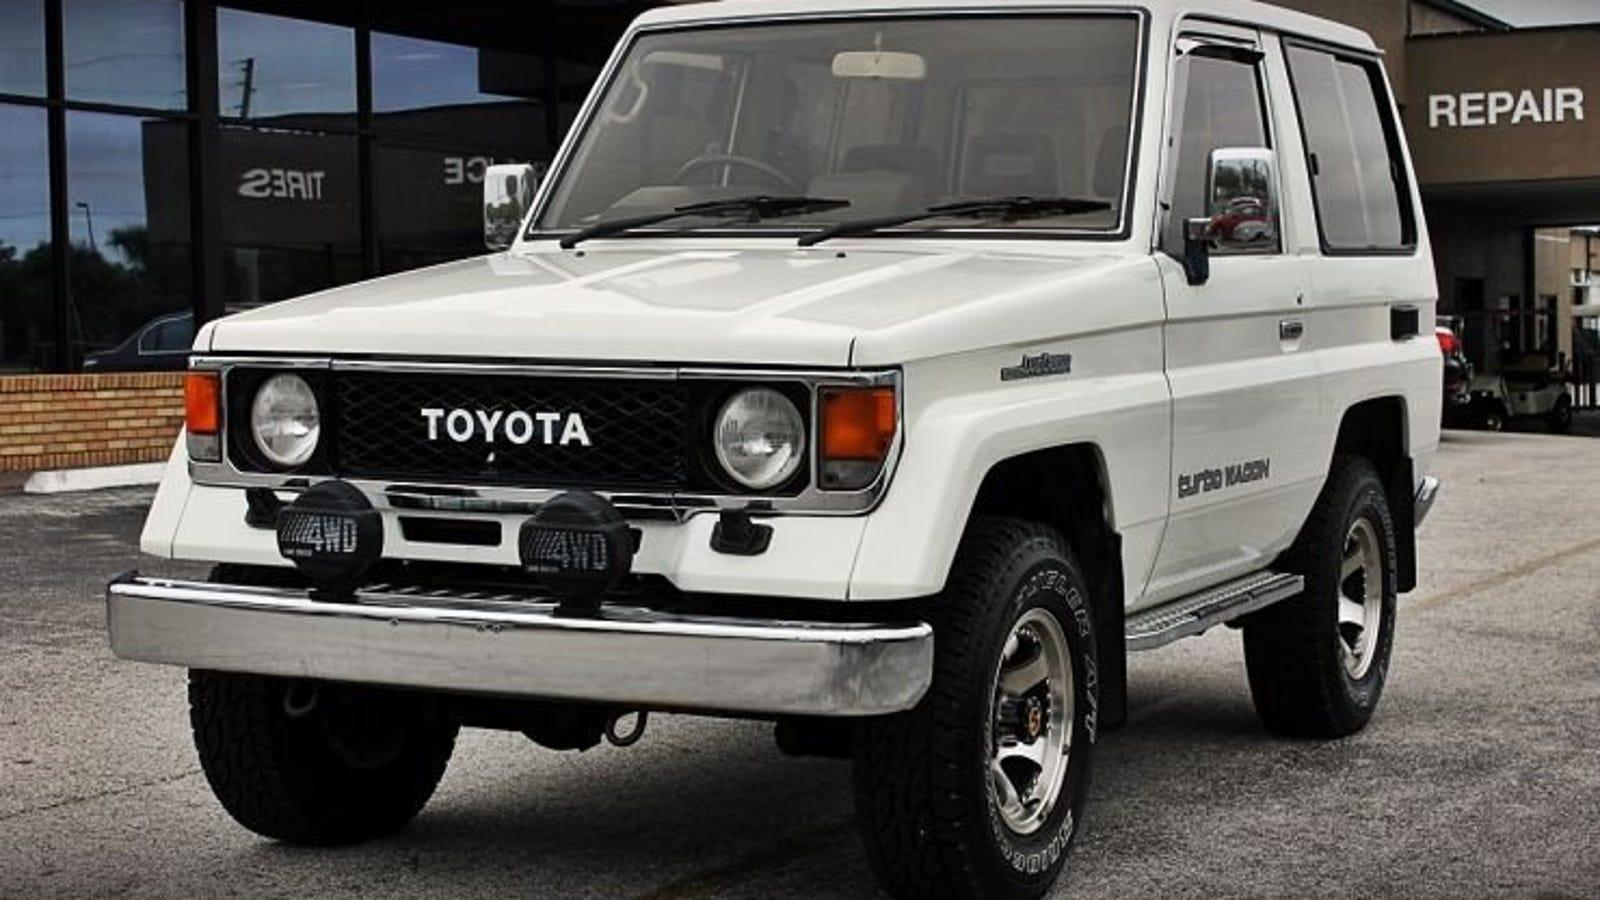 Toyota Land Cruiser J70 >> Npocp 1987 Toyota Land Cruiser J70 2 Door Turbo Diesel 19 975